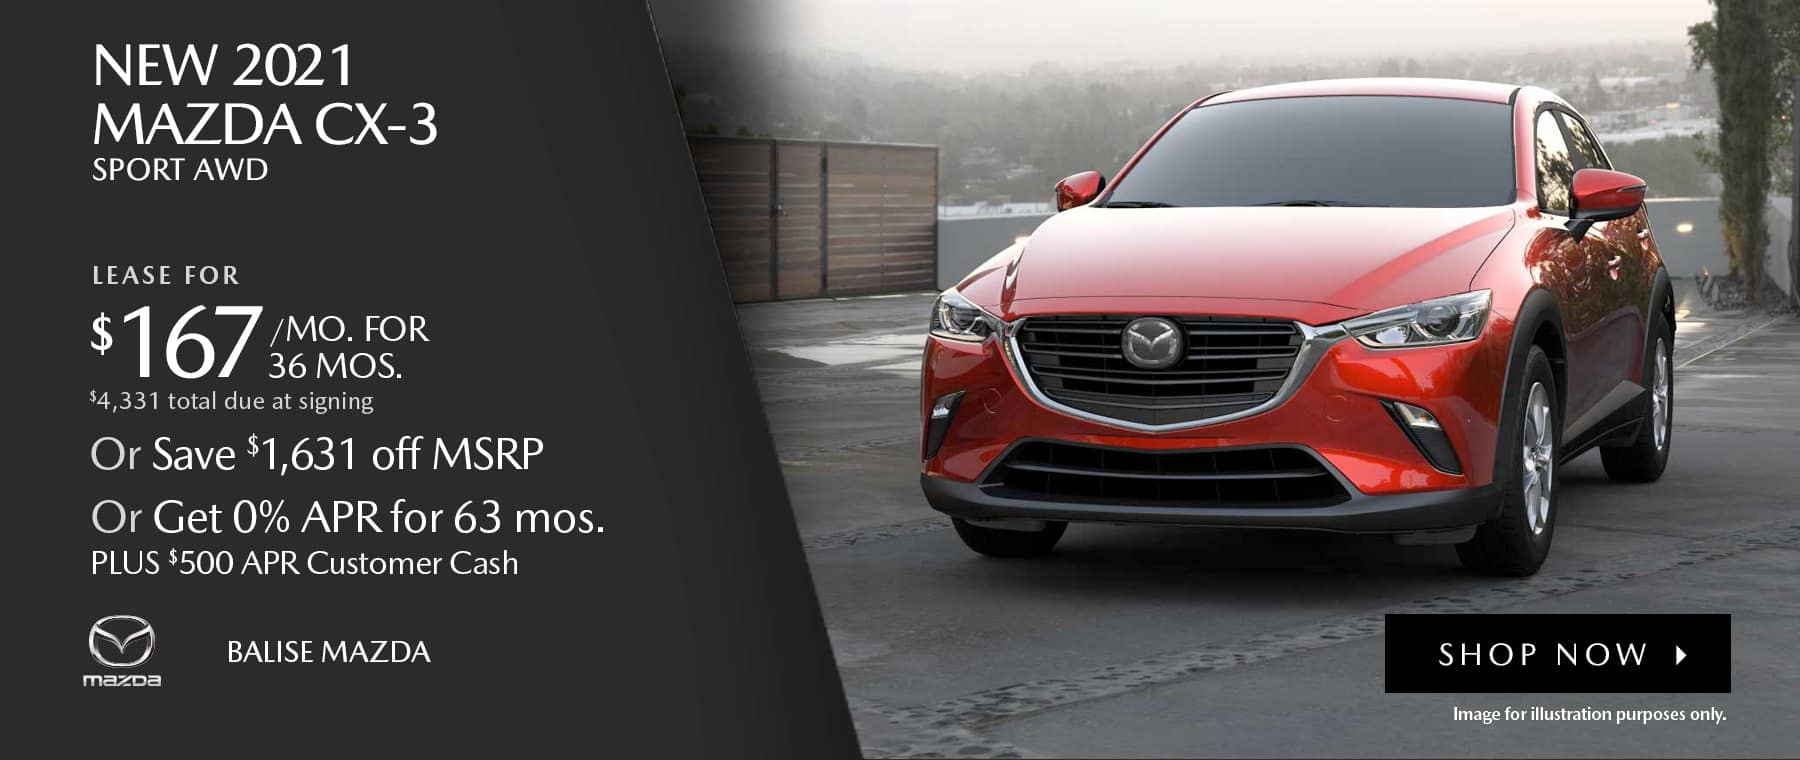 BMAZ-HomePageBanner-1800×760-New 2021 Mazda CX-3 Sport AWD_05'21